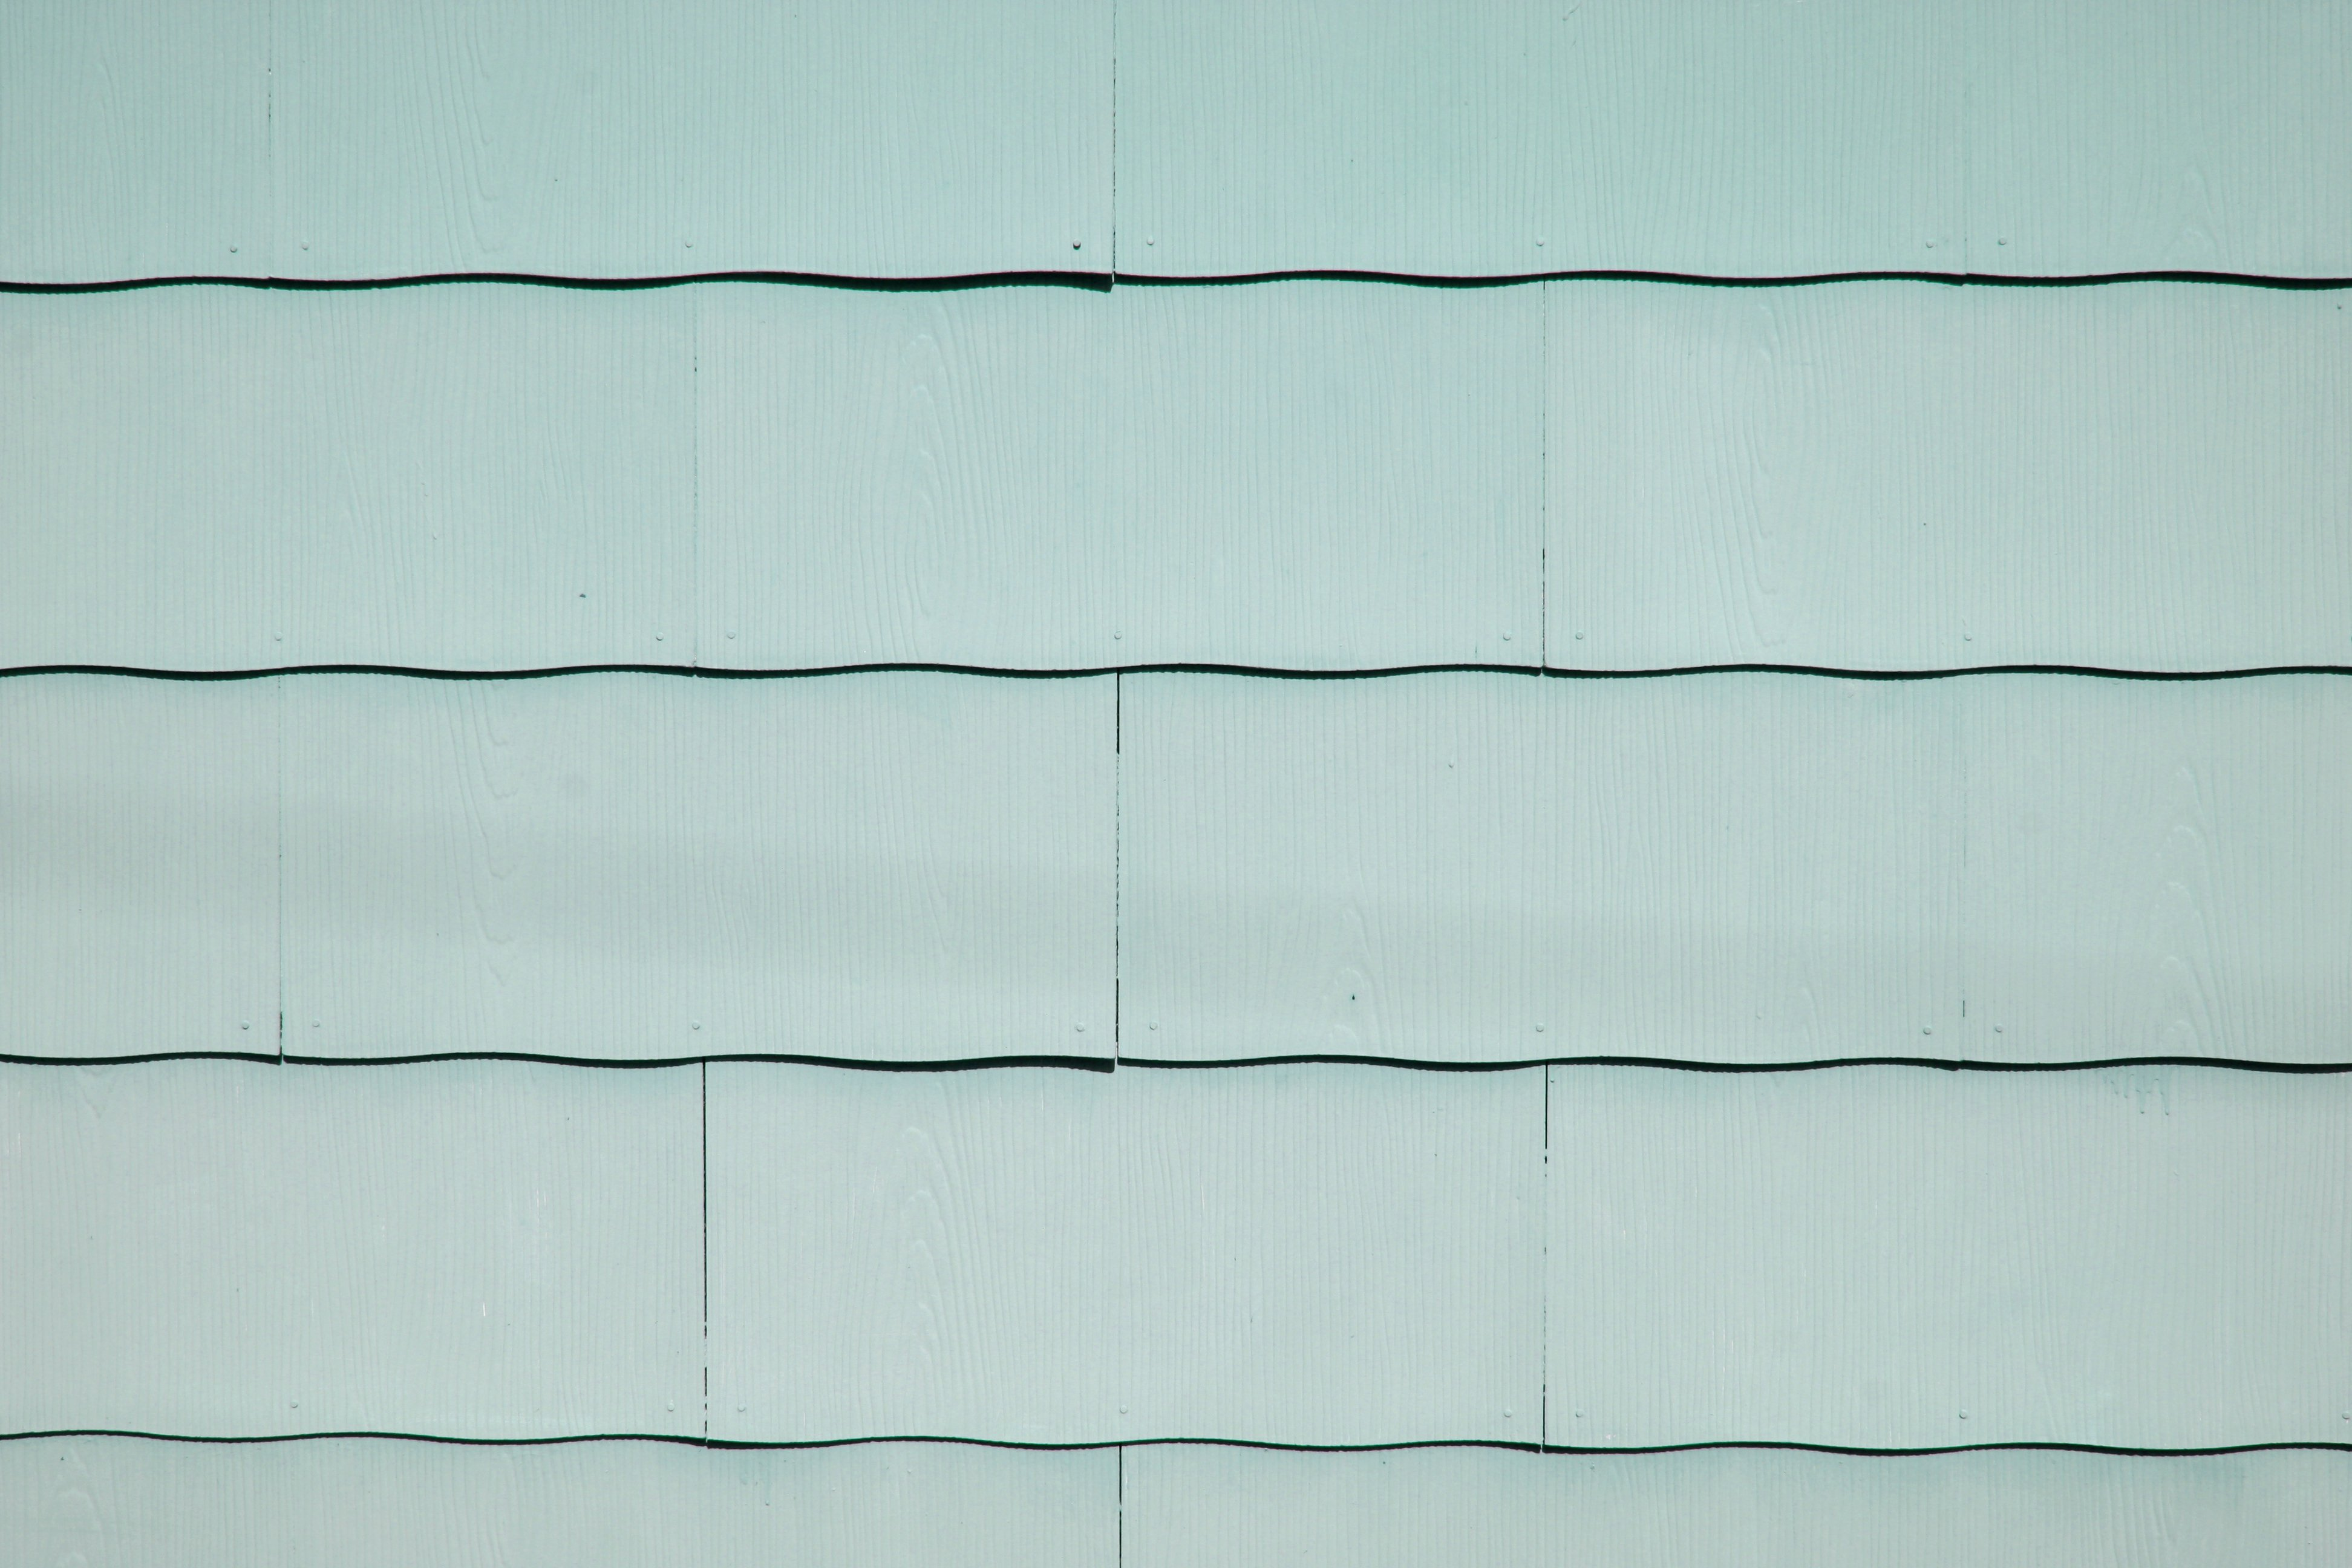 Sage Green Scalloped Asbestos Siding Shingles Texture